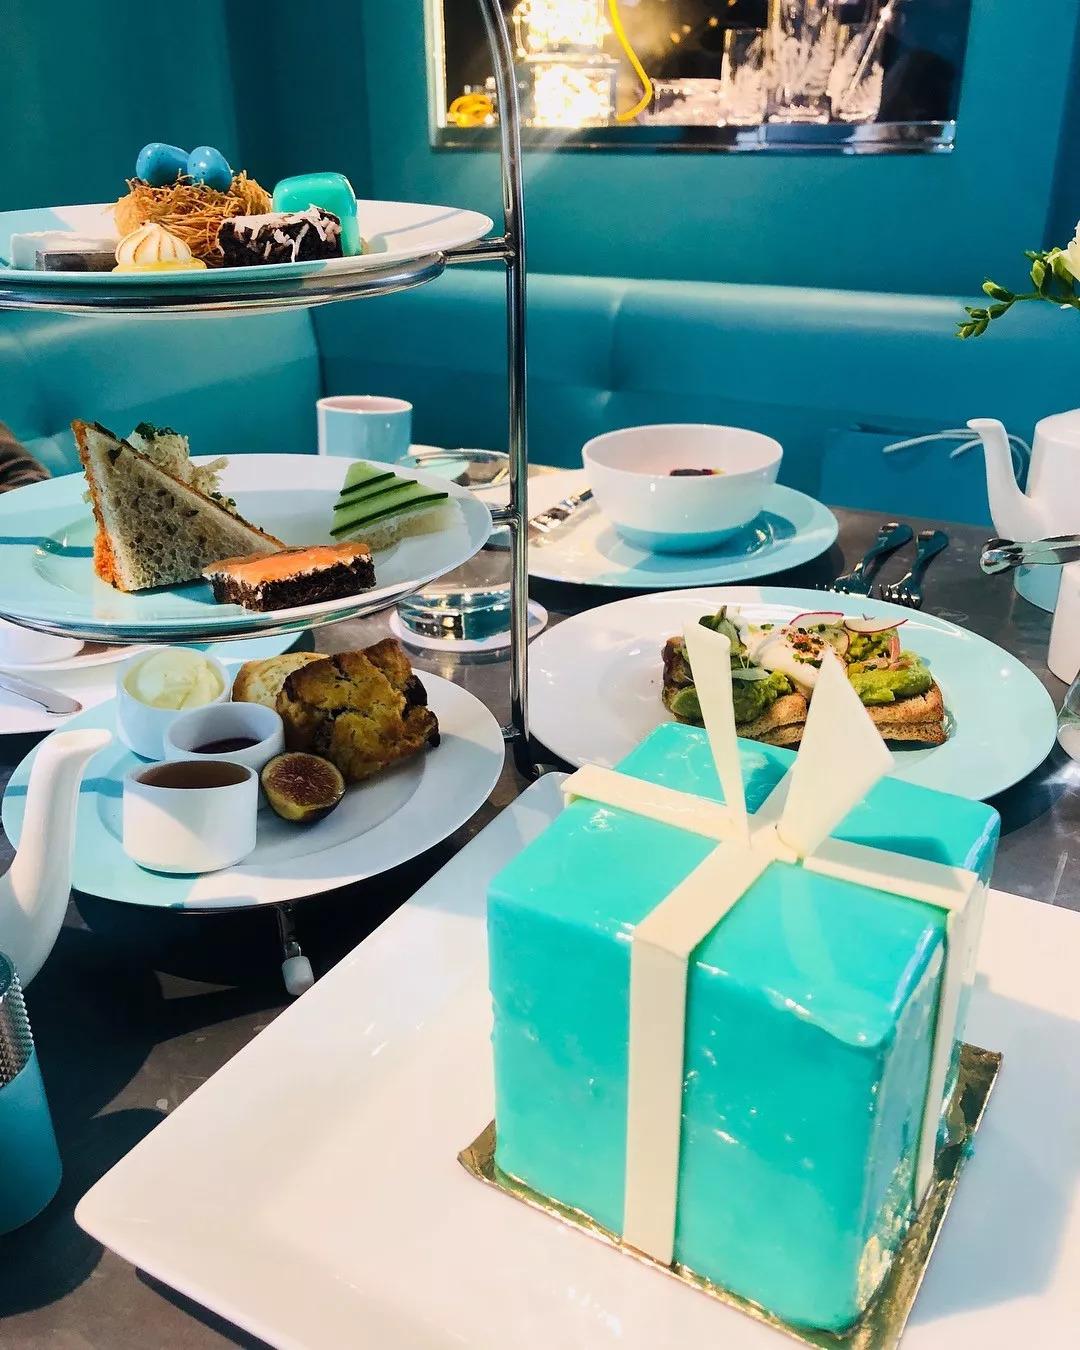 Tiffany早餐店和GUCCI咖啡馆 奢侈品牌开的餐厅是什么样子